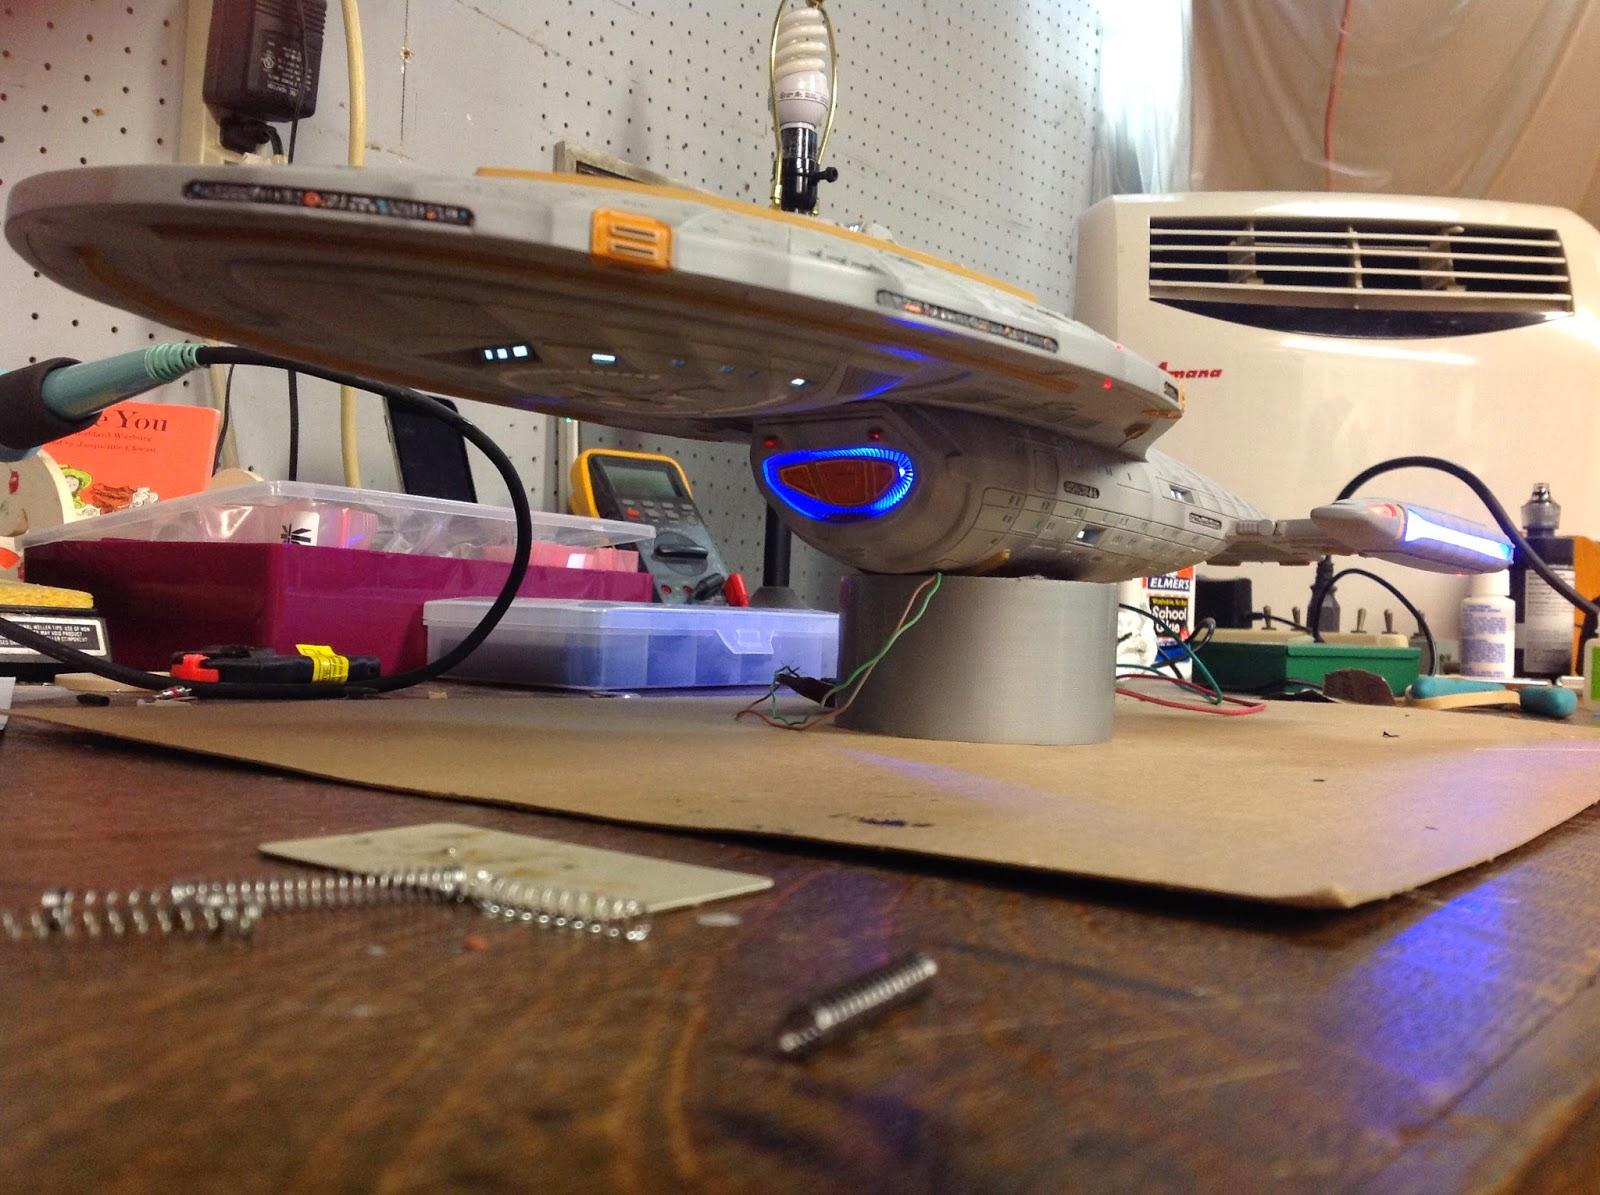 Star Trek scale model Voyager